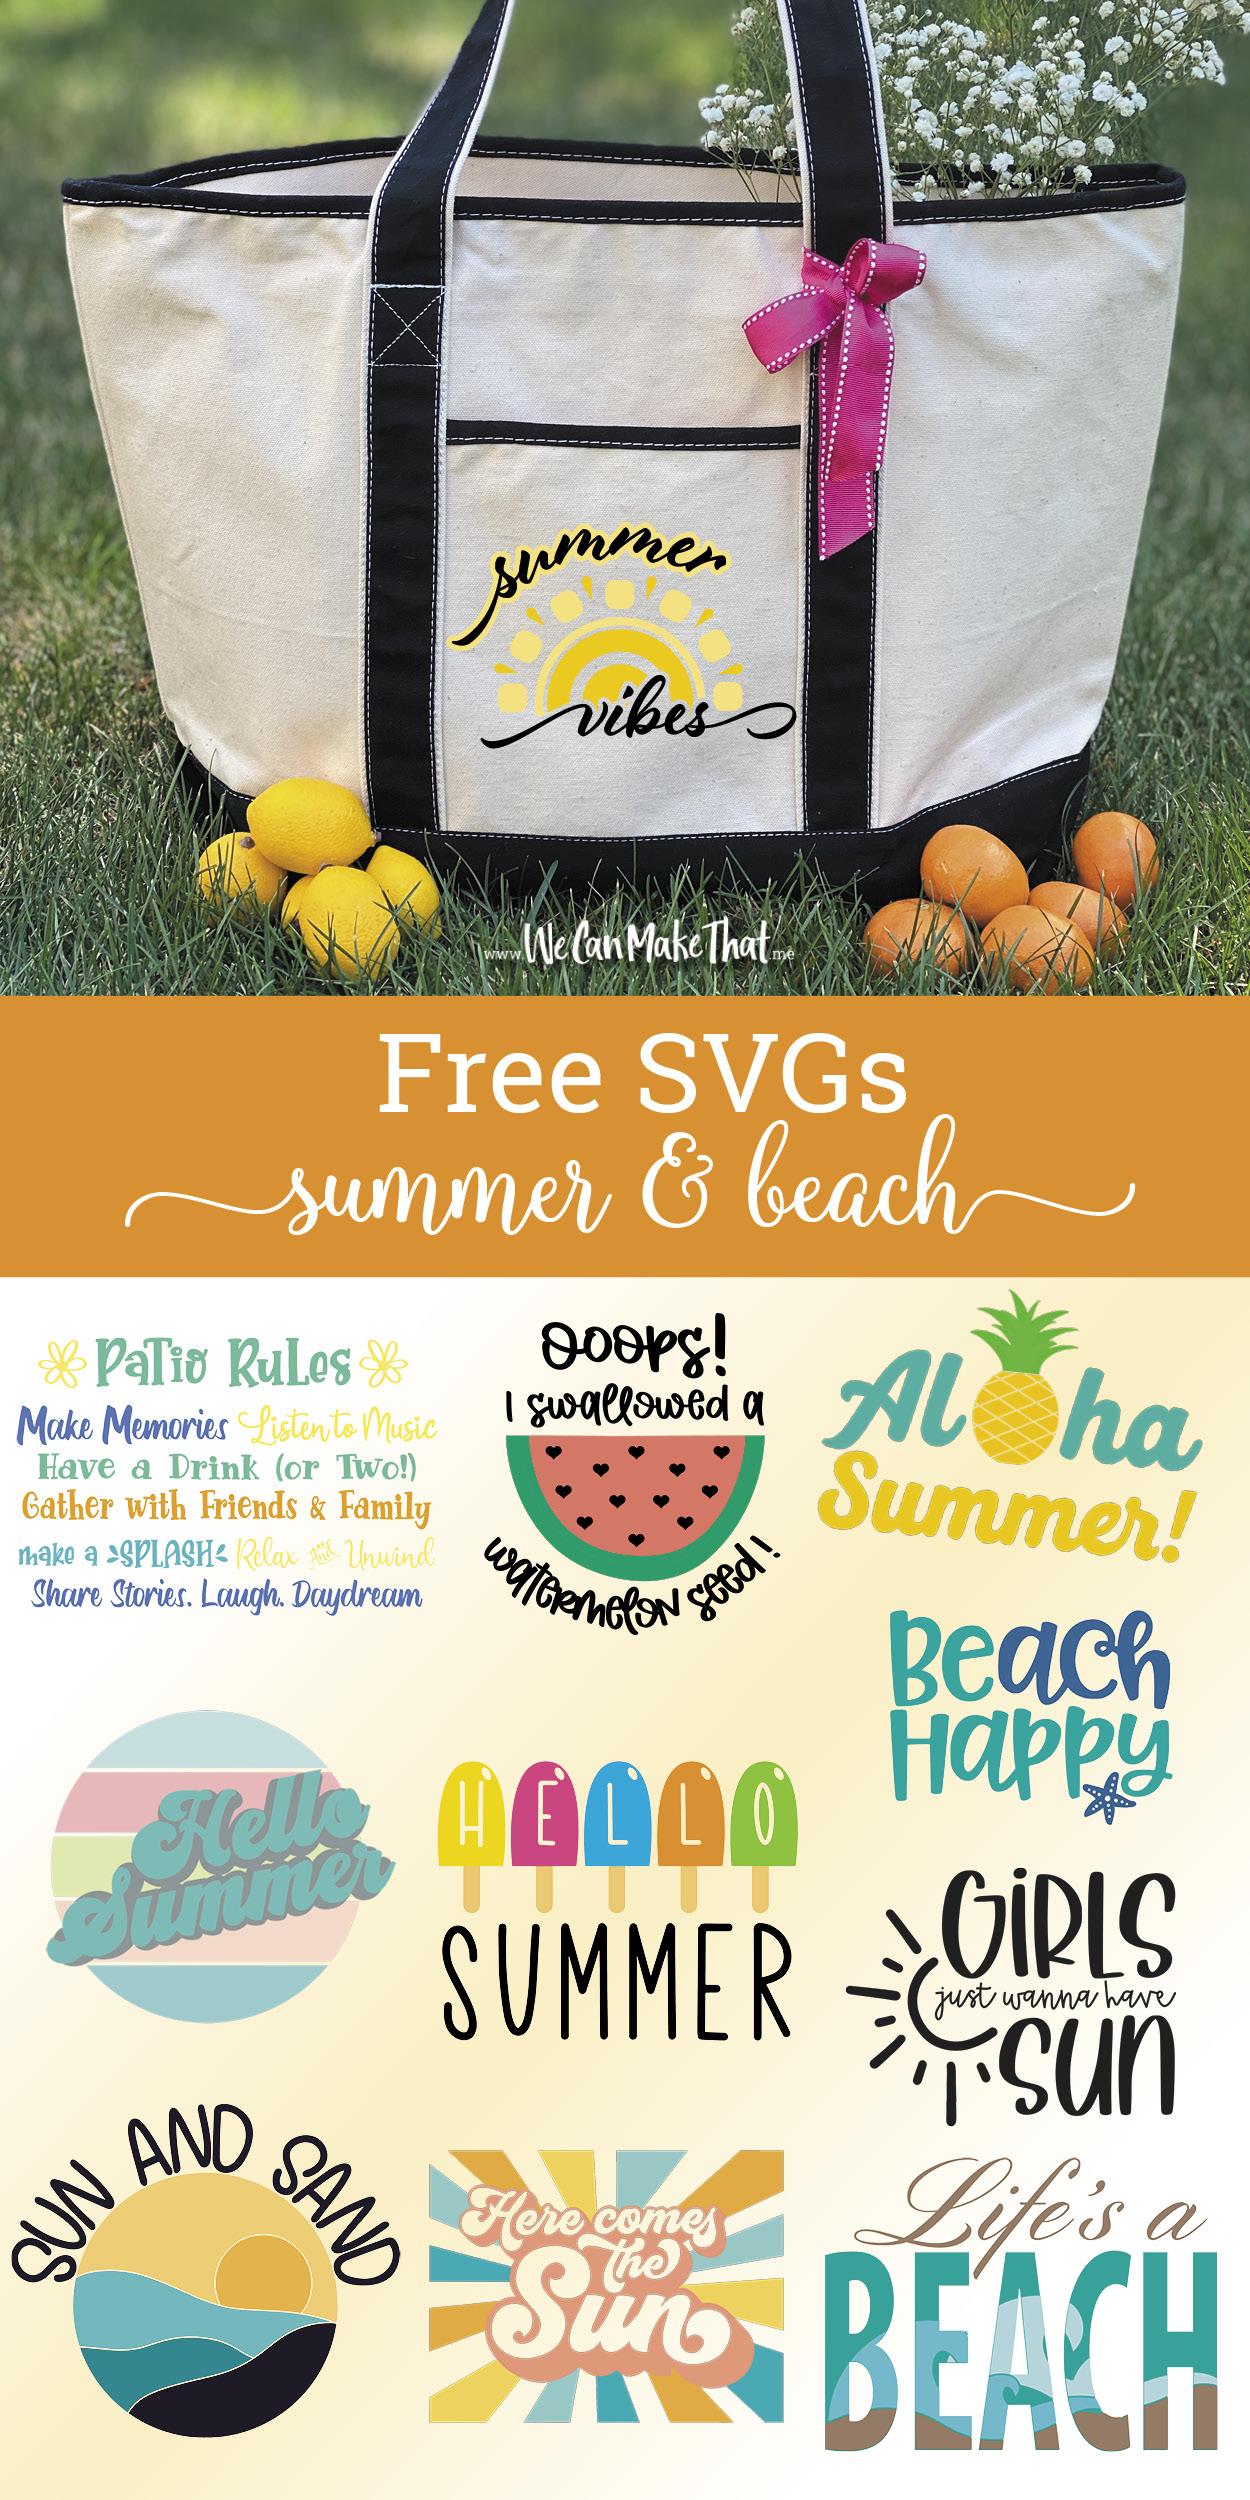 beachy svgs free